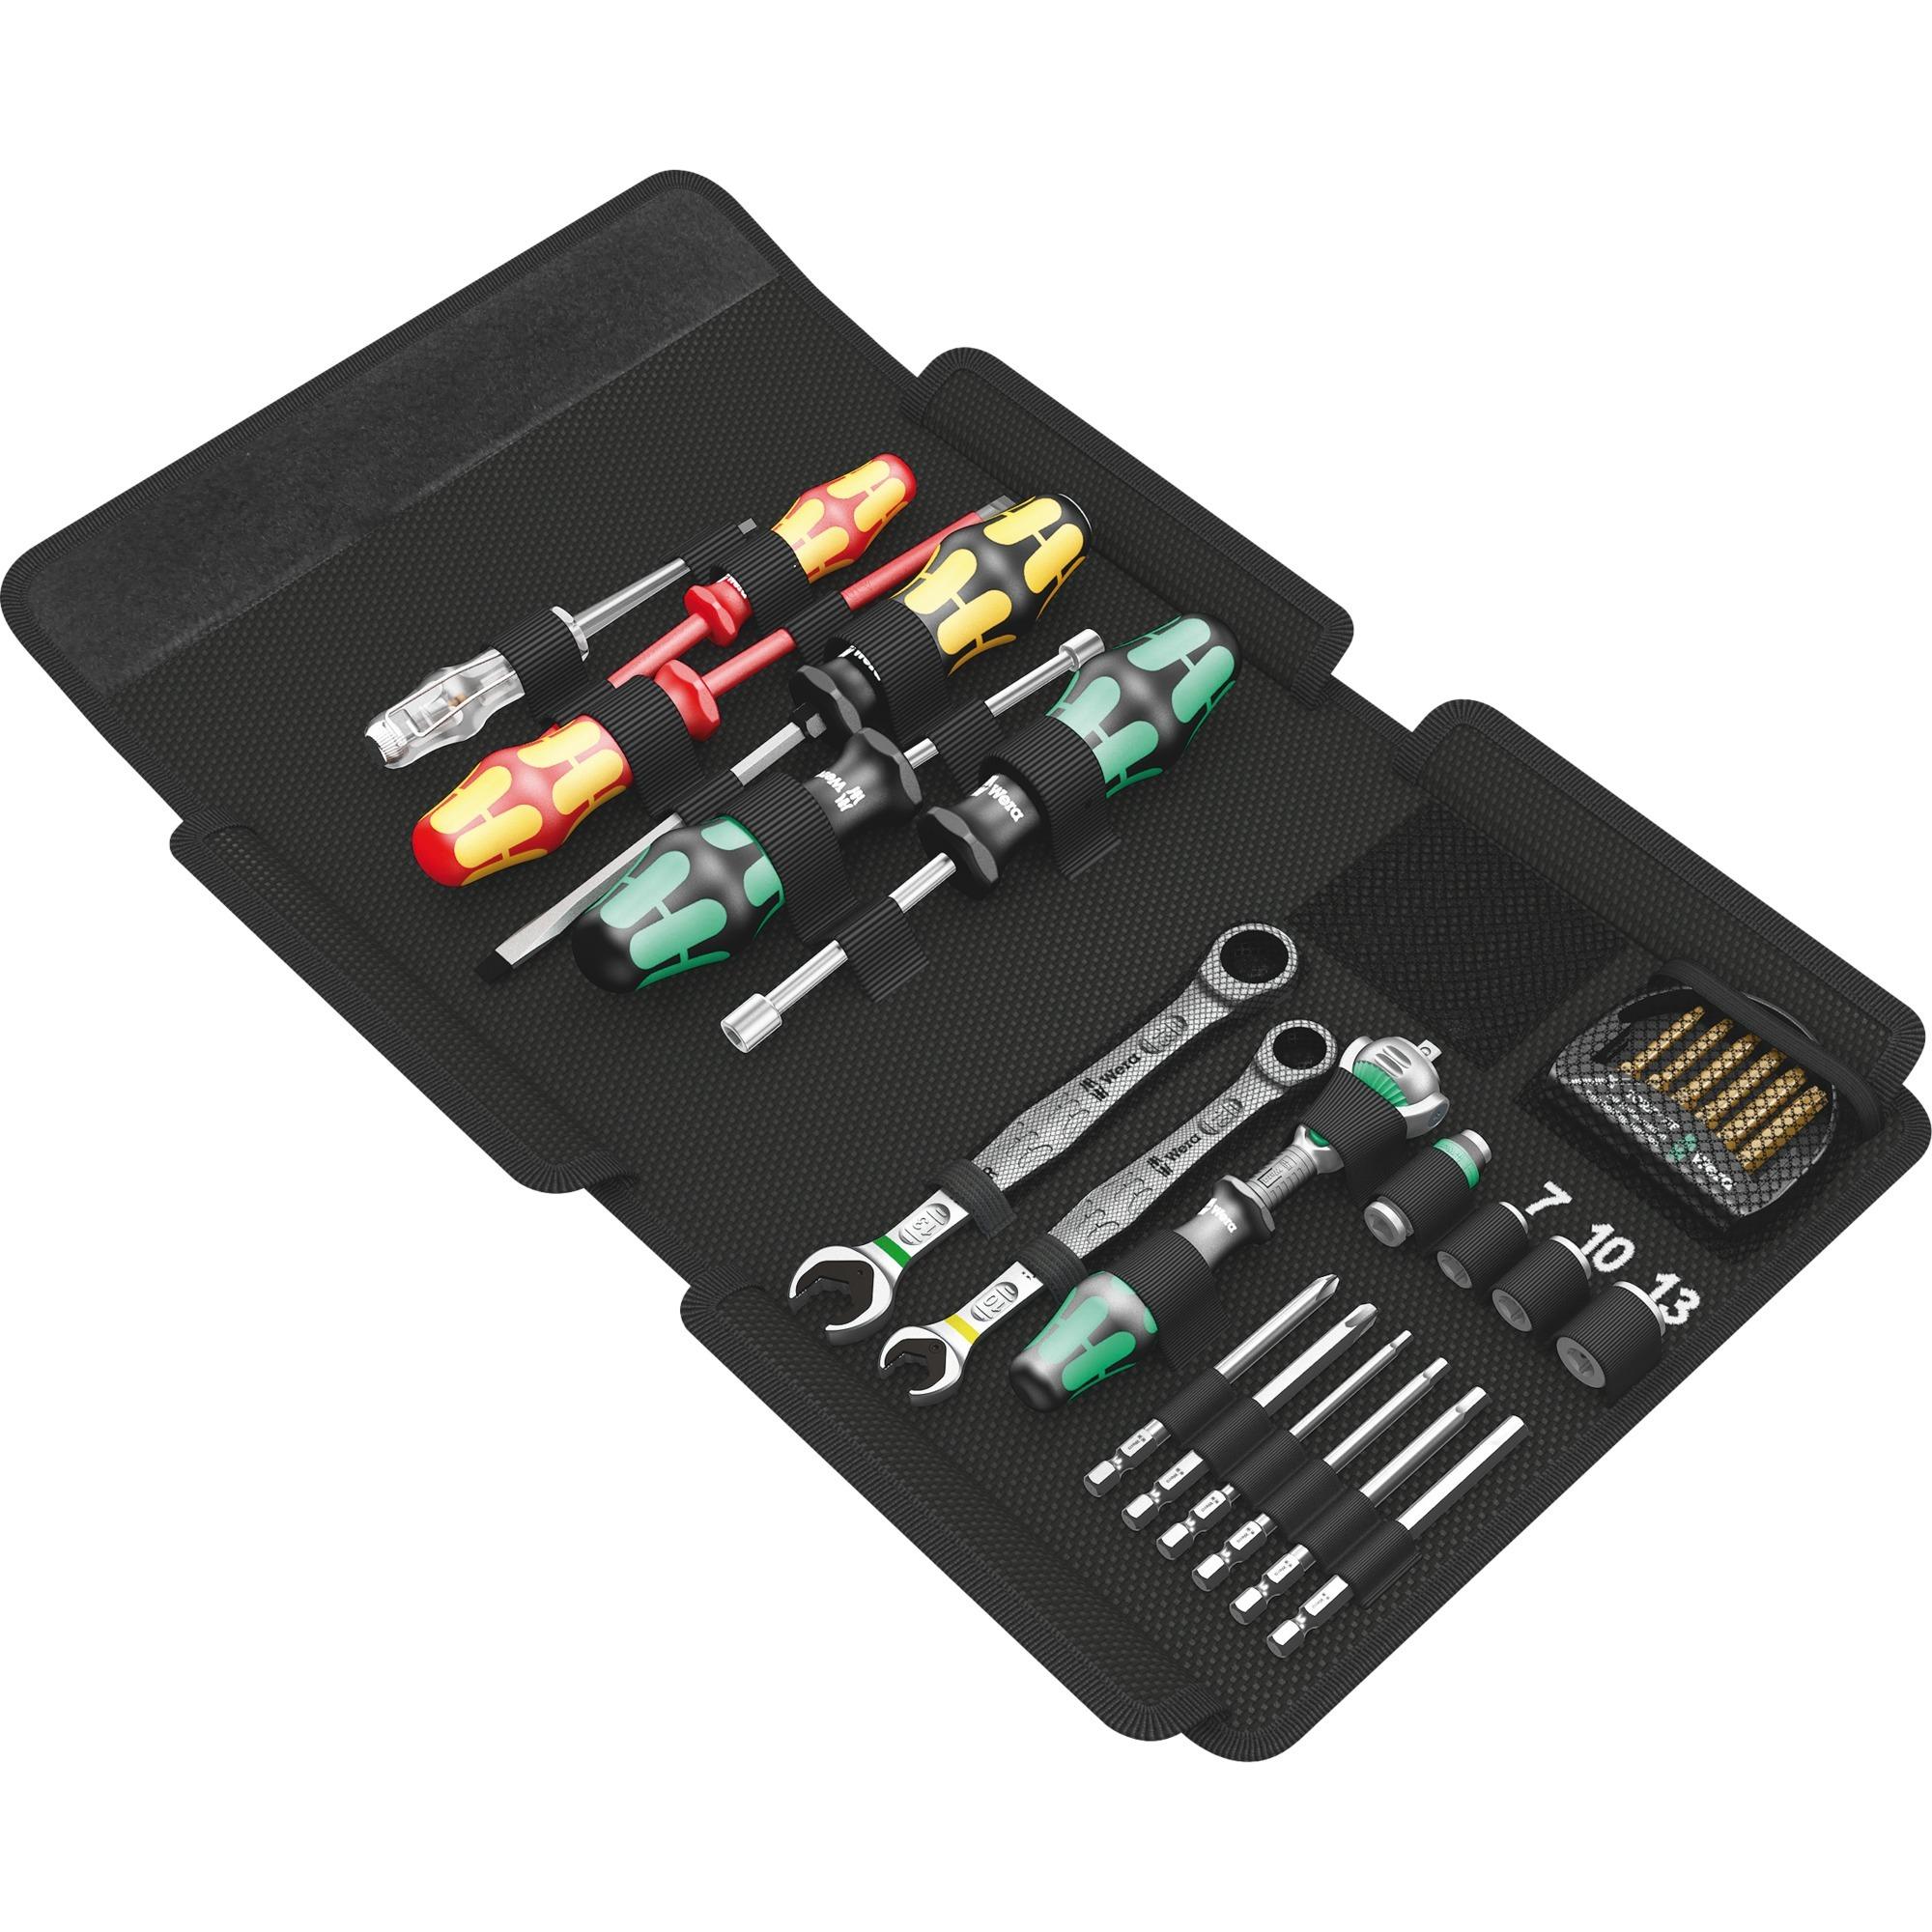 Kompakt SH 1 PlumbKit set di strumenti meccanici 9 strumenti